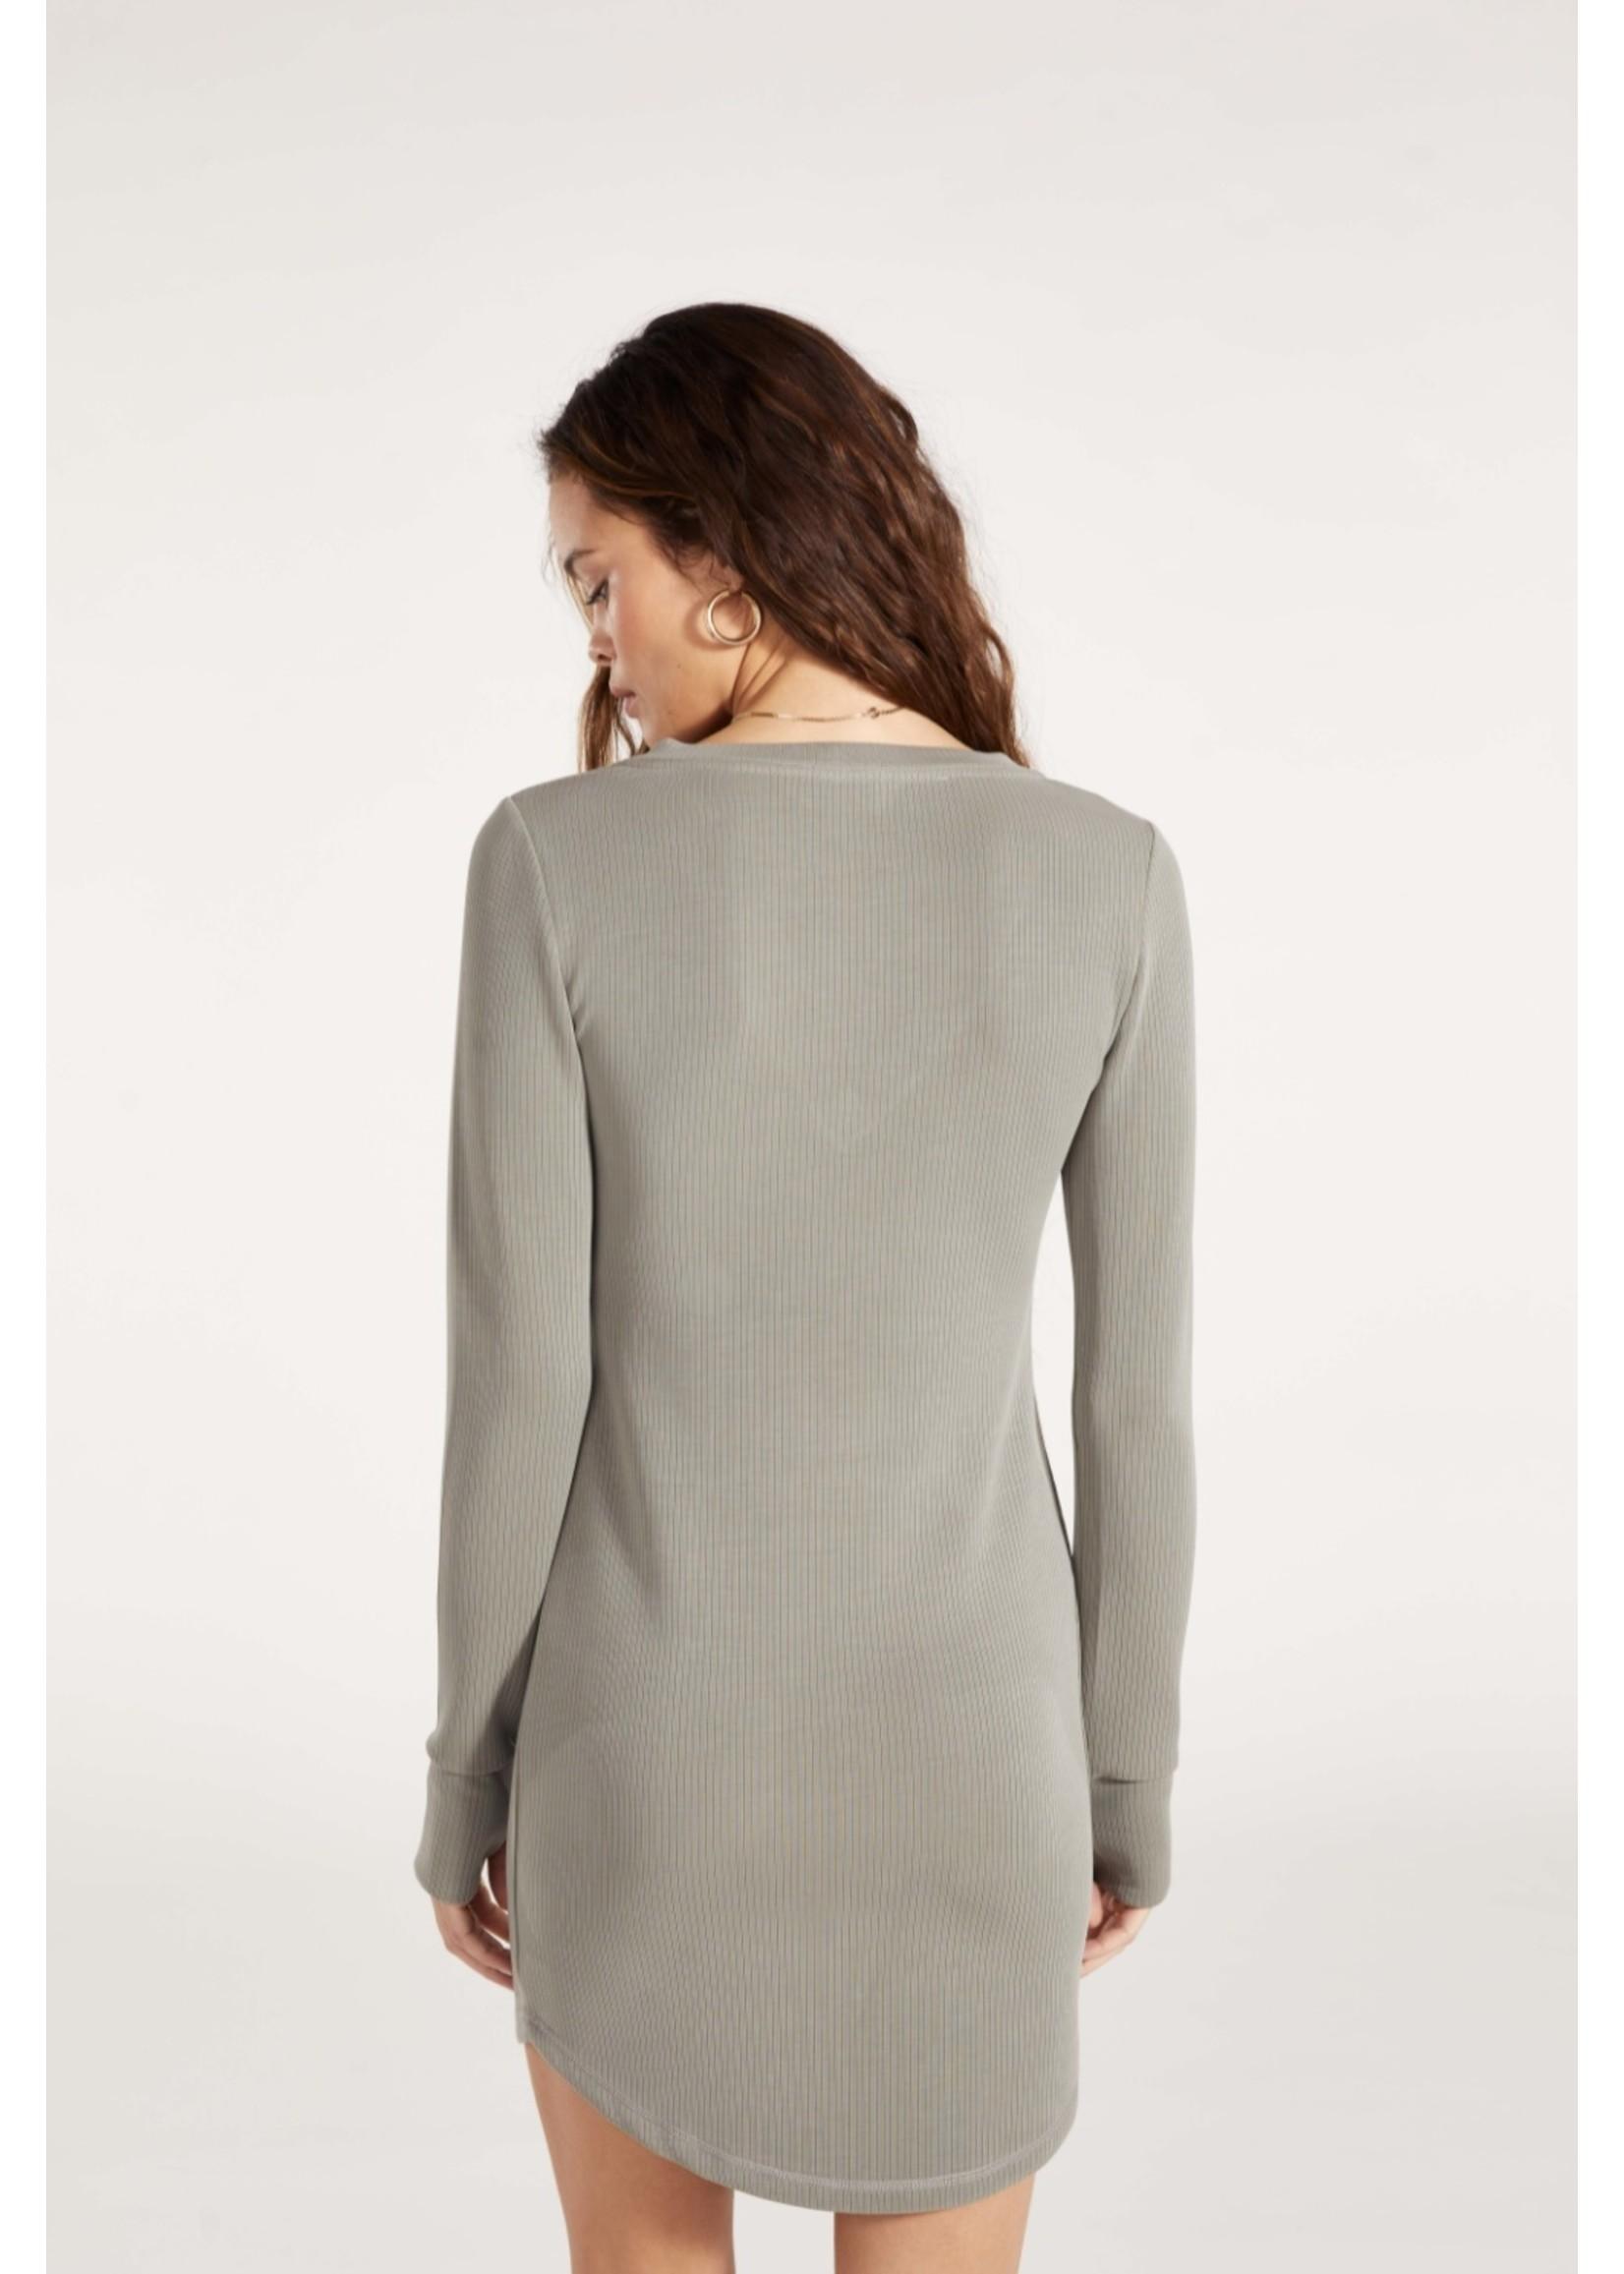 BB Dakota V Specific Dress - BL308235